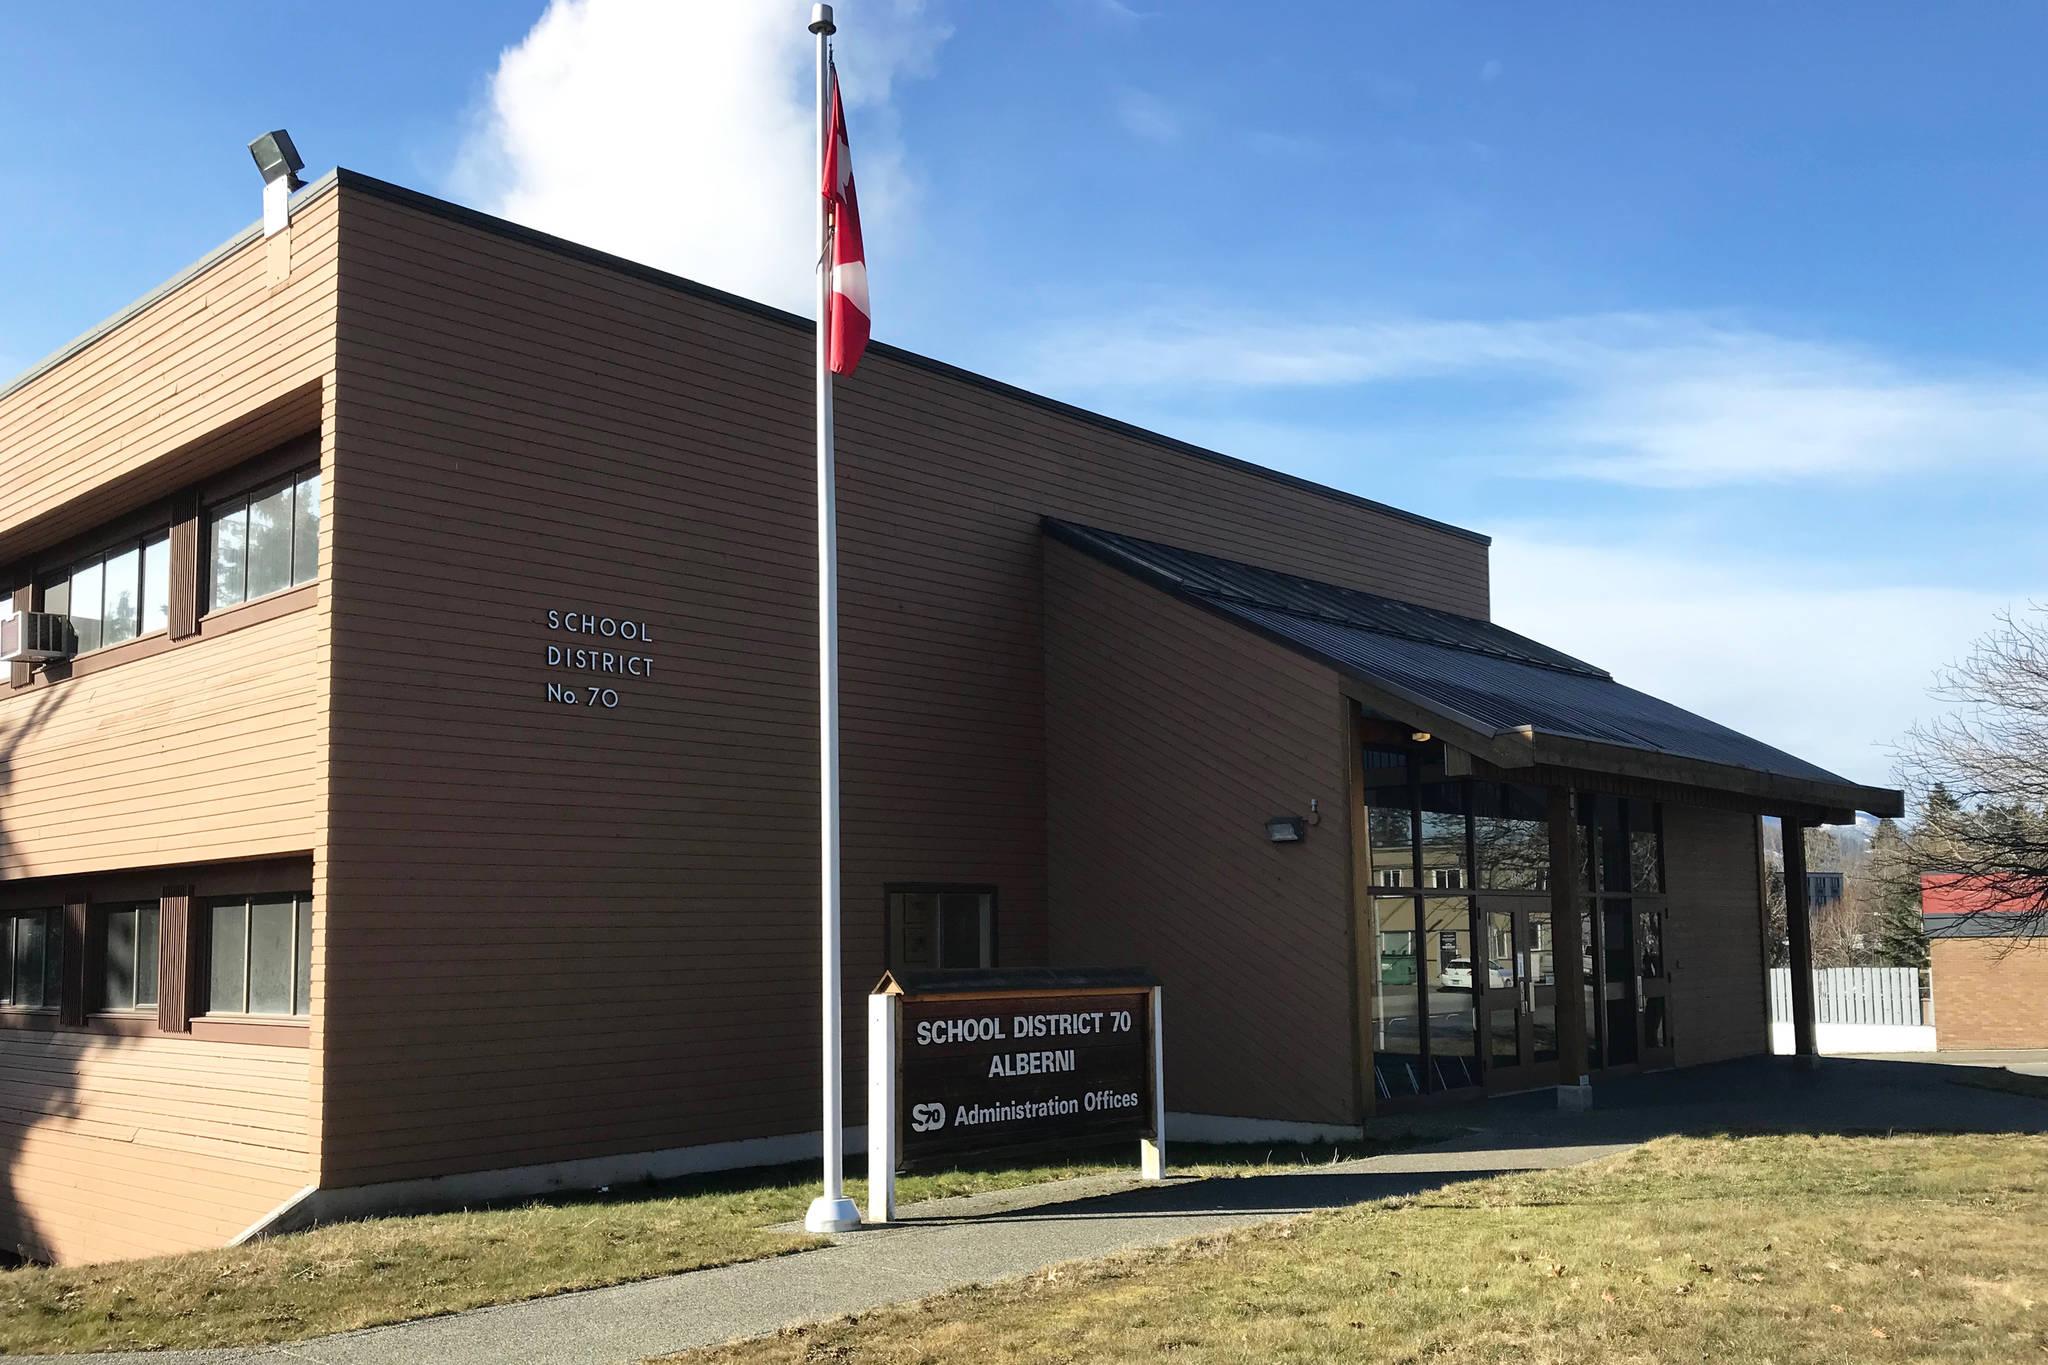 The School District 70 administration office in Port Alberni. AV NEWS FILE PHOTO